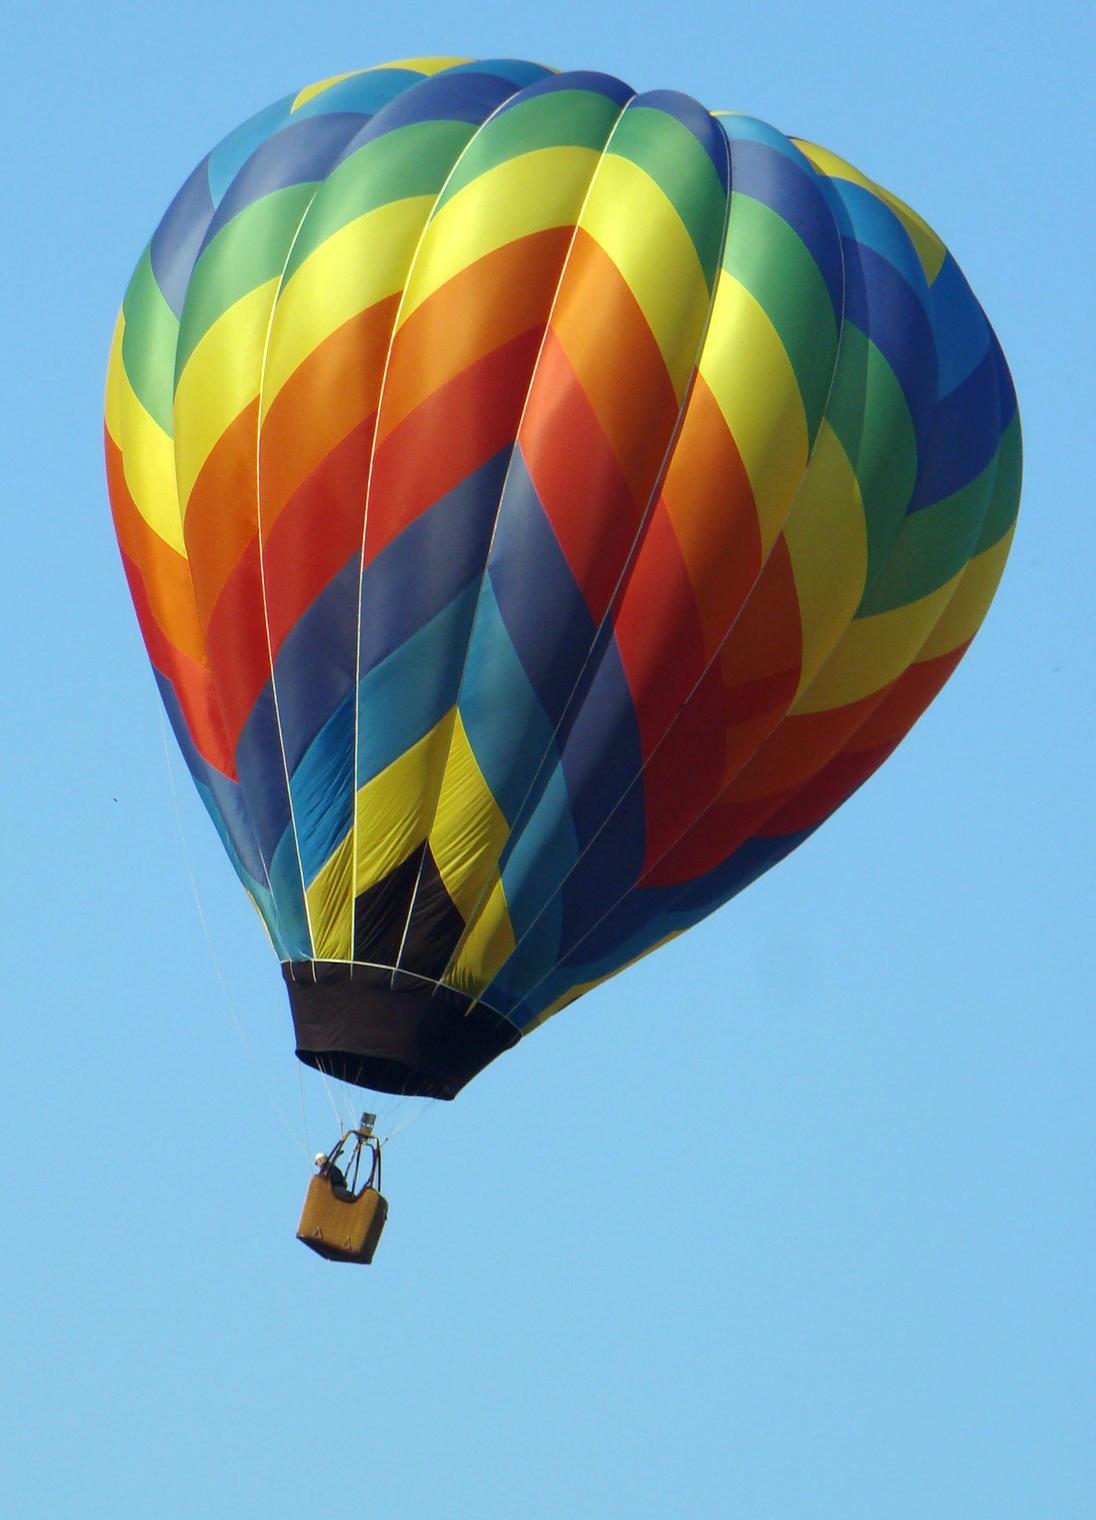 Montgolfier Balloon Gift Shoppe | Gypsy Road Trip